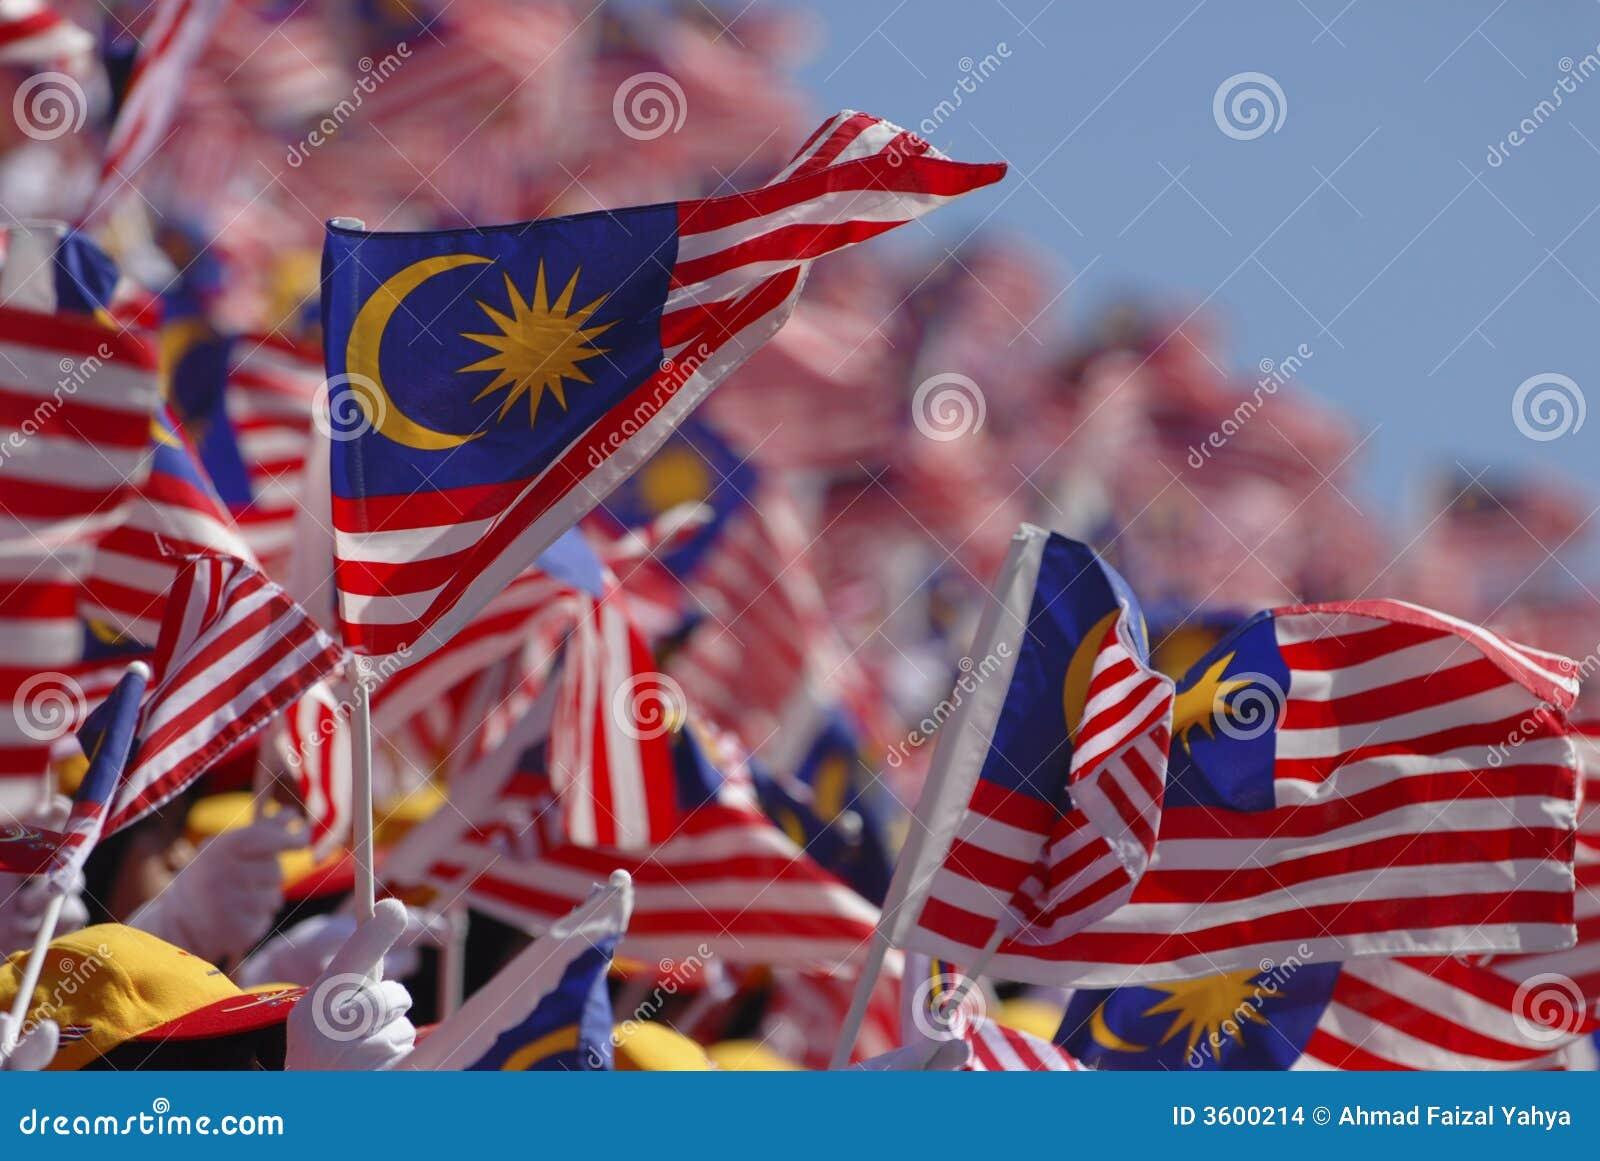 Malezyjska bandery